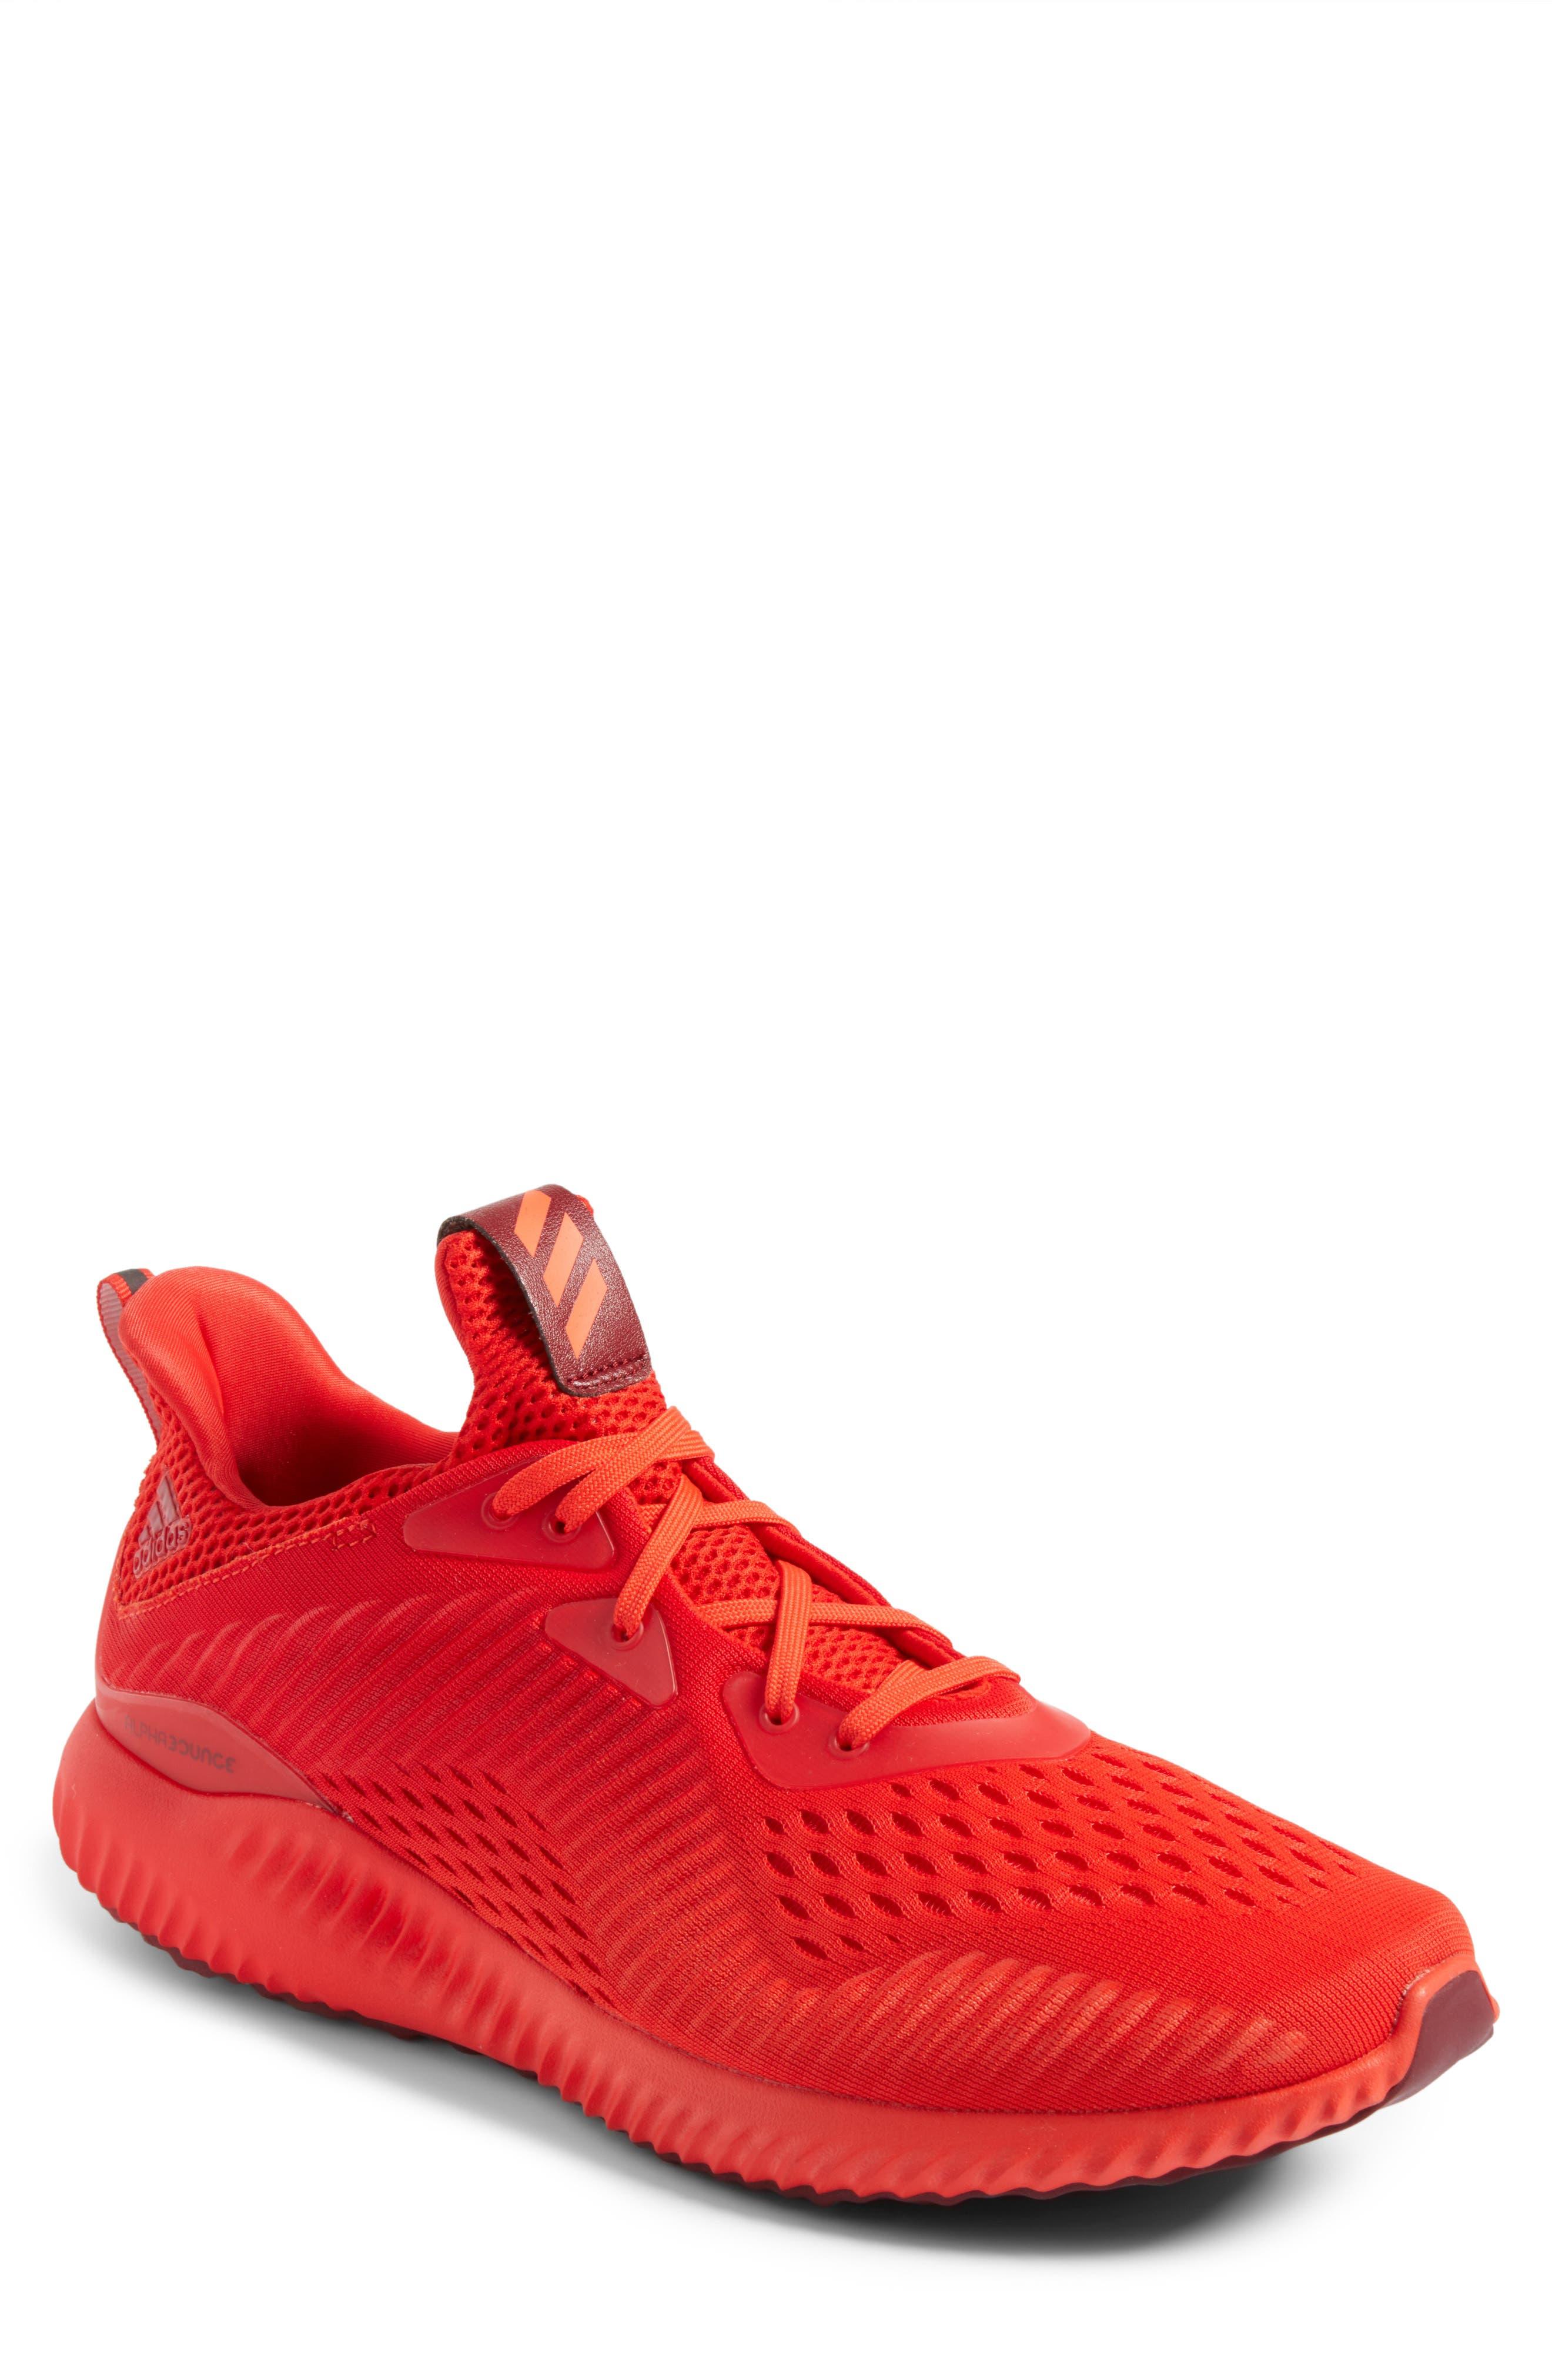 ADIDAS Alphabounce Running Shoe